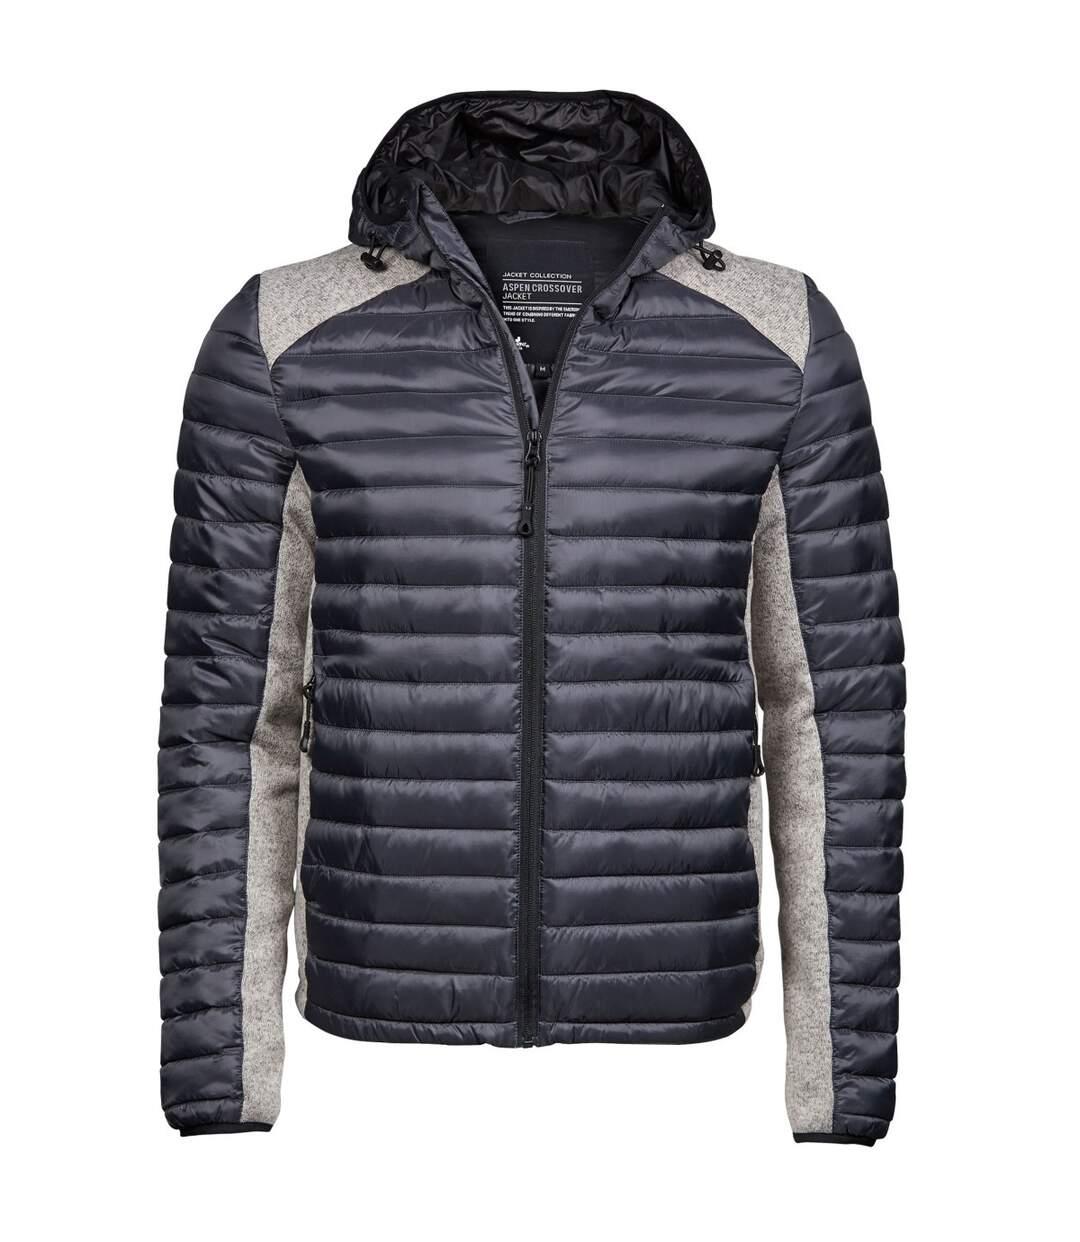 Tee Jays Mens Aspen Crossover Jacket (Cosmic Grey/Grey Melange) - UTBC3929